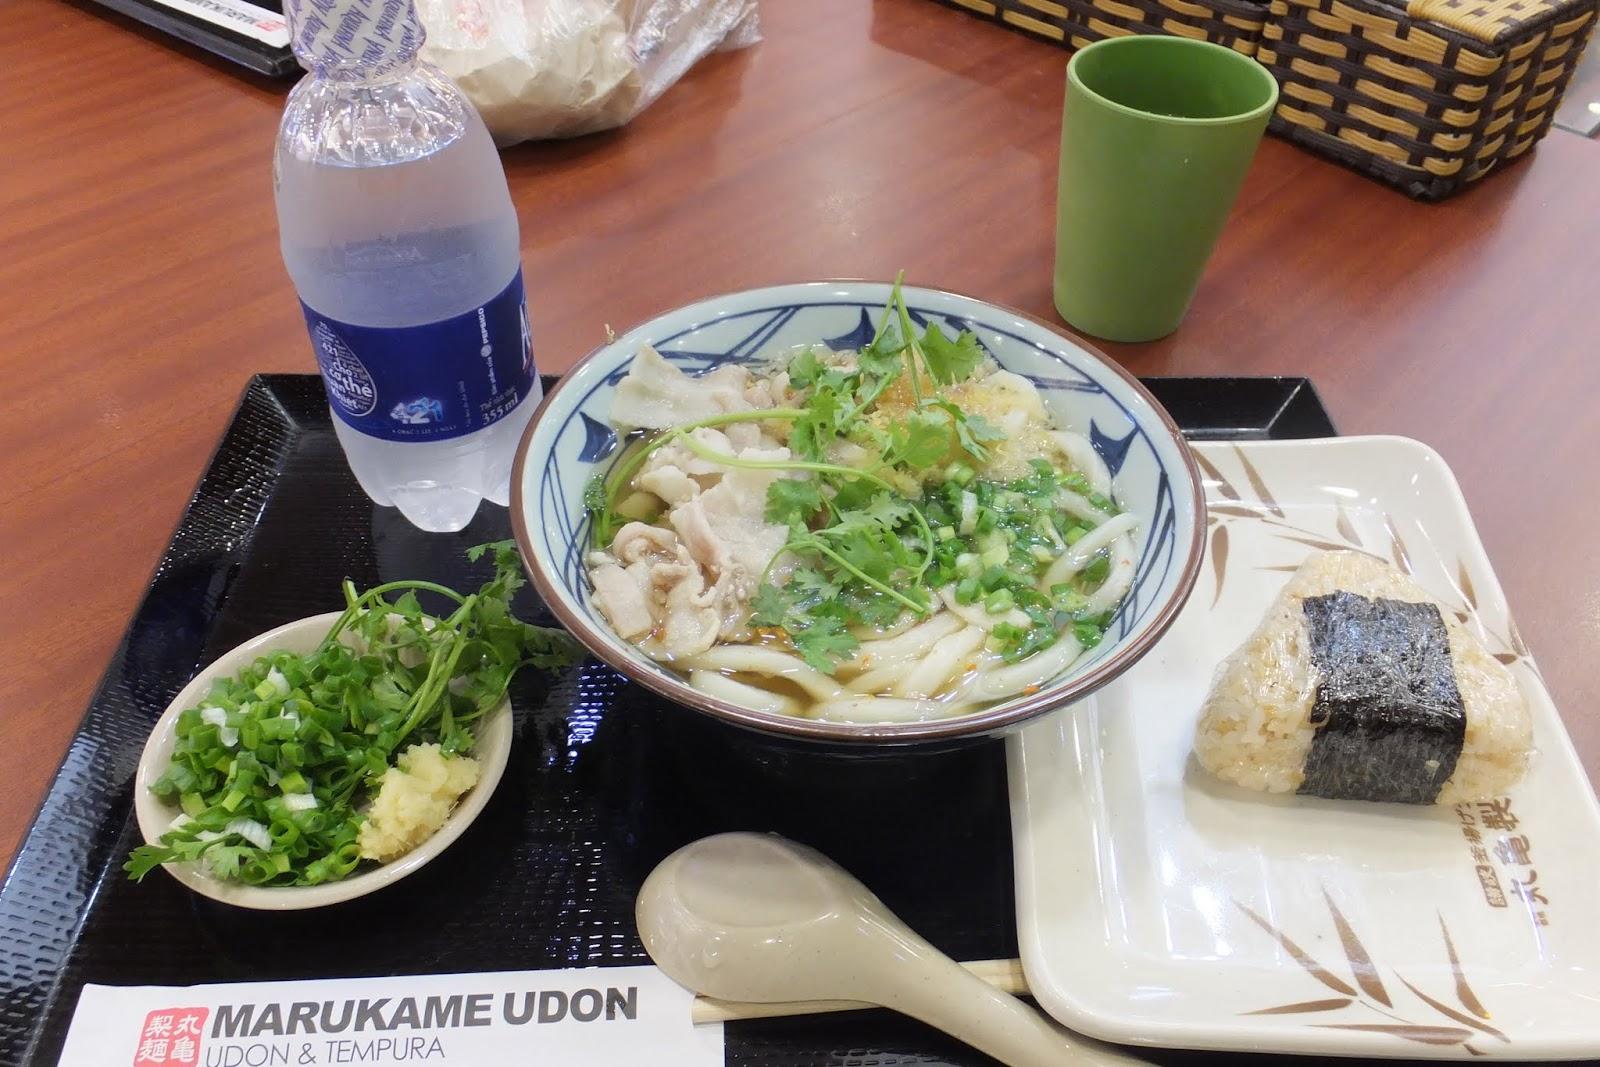 marukame-spicy-pork-udon